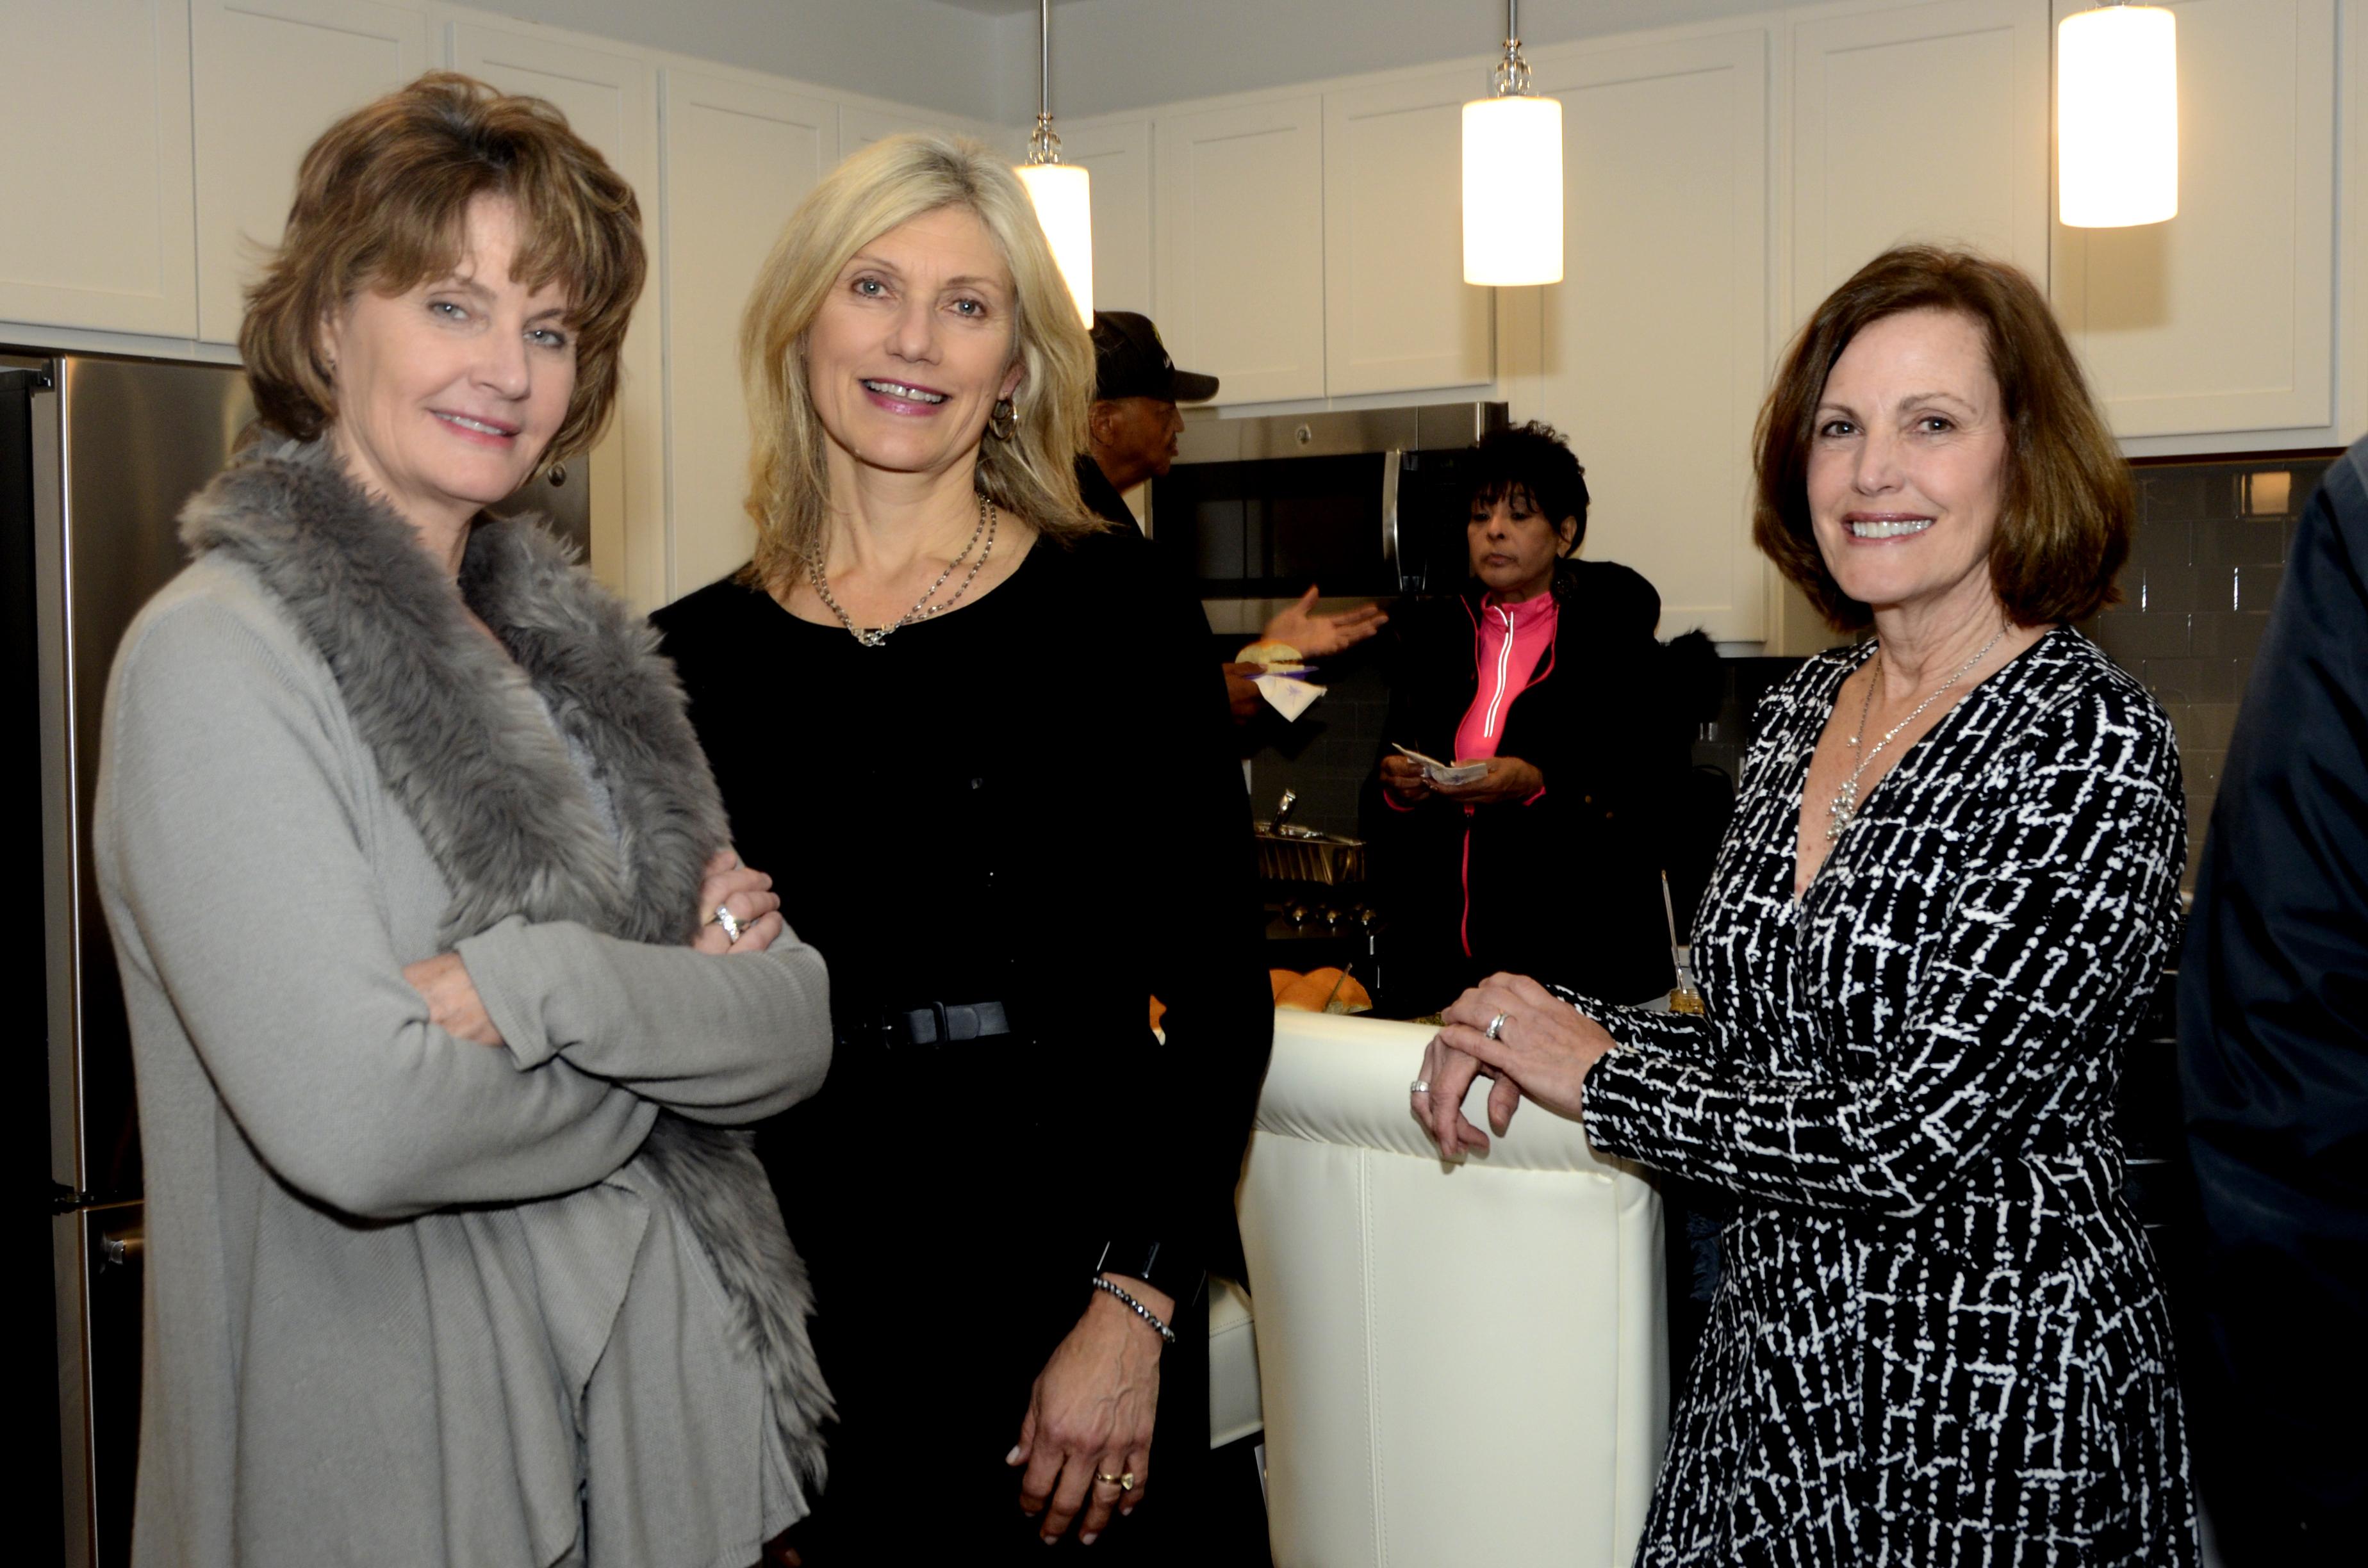 013-Patti-MichelsBW-Carol-CroftonBW-Karen-Bailey-MeyerBW-JPG.jpg